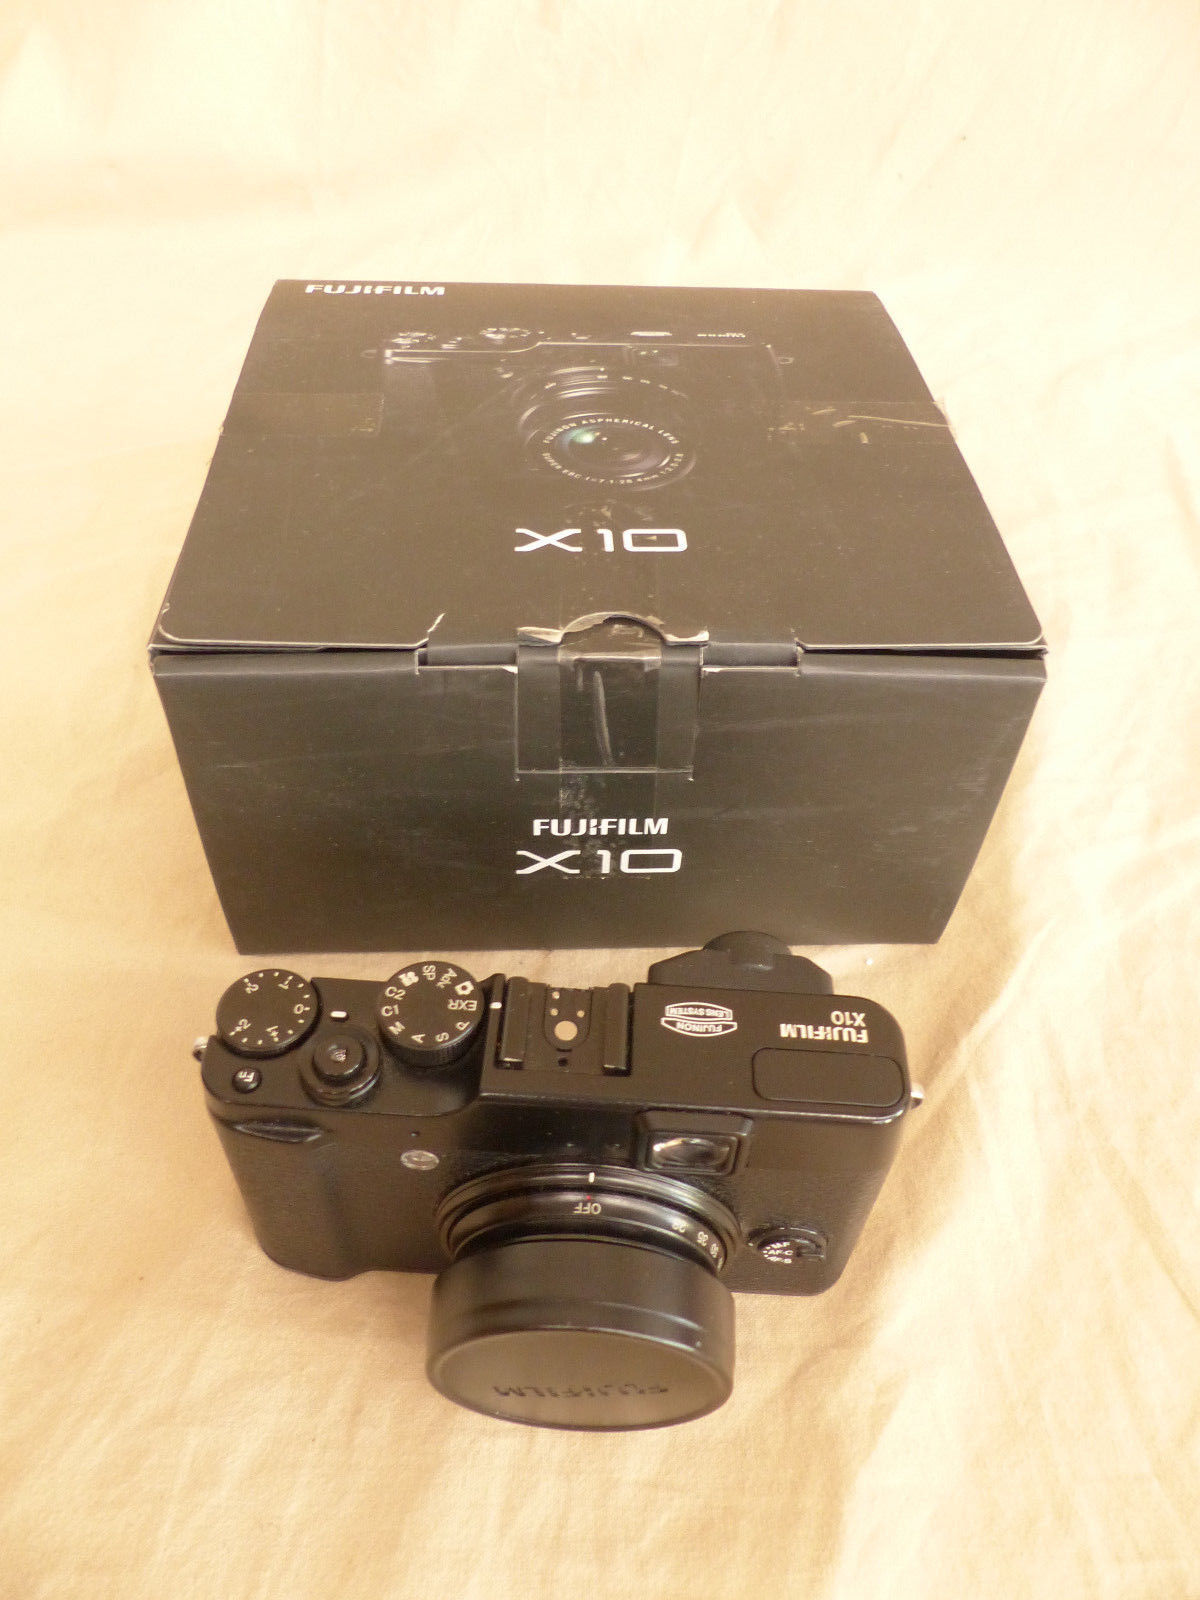 Fujifilm X10 Digital Kamera ungetestet